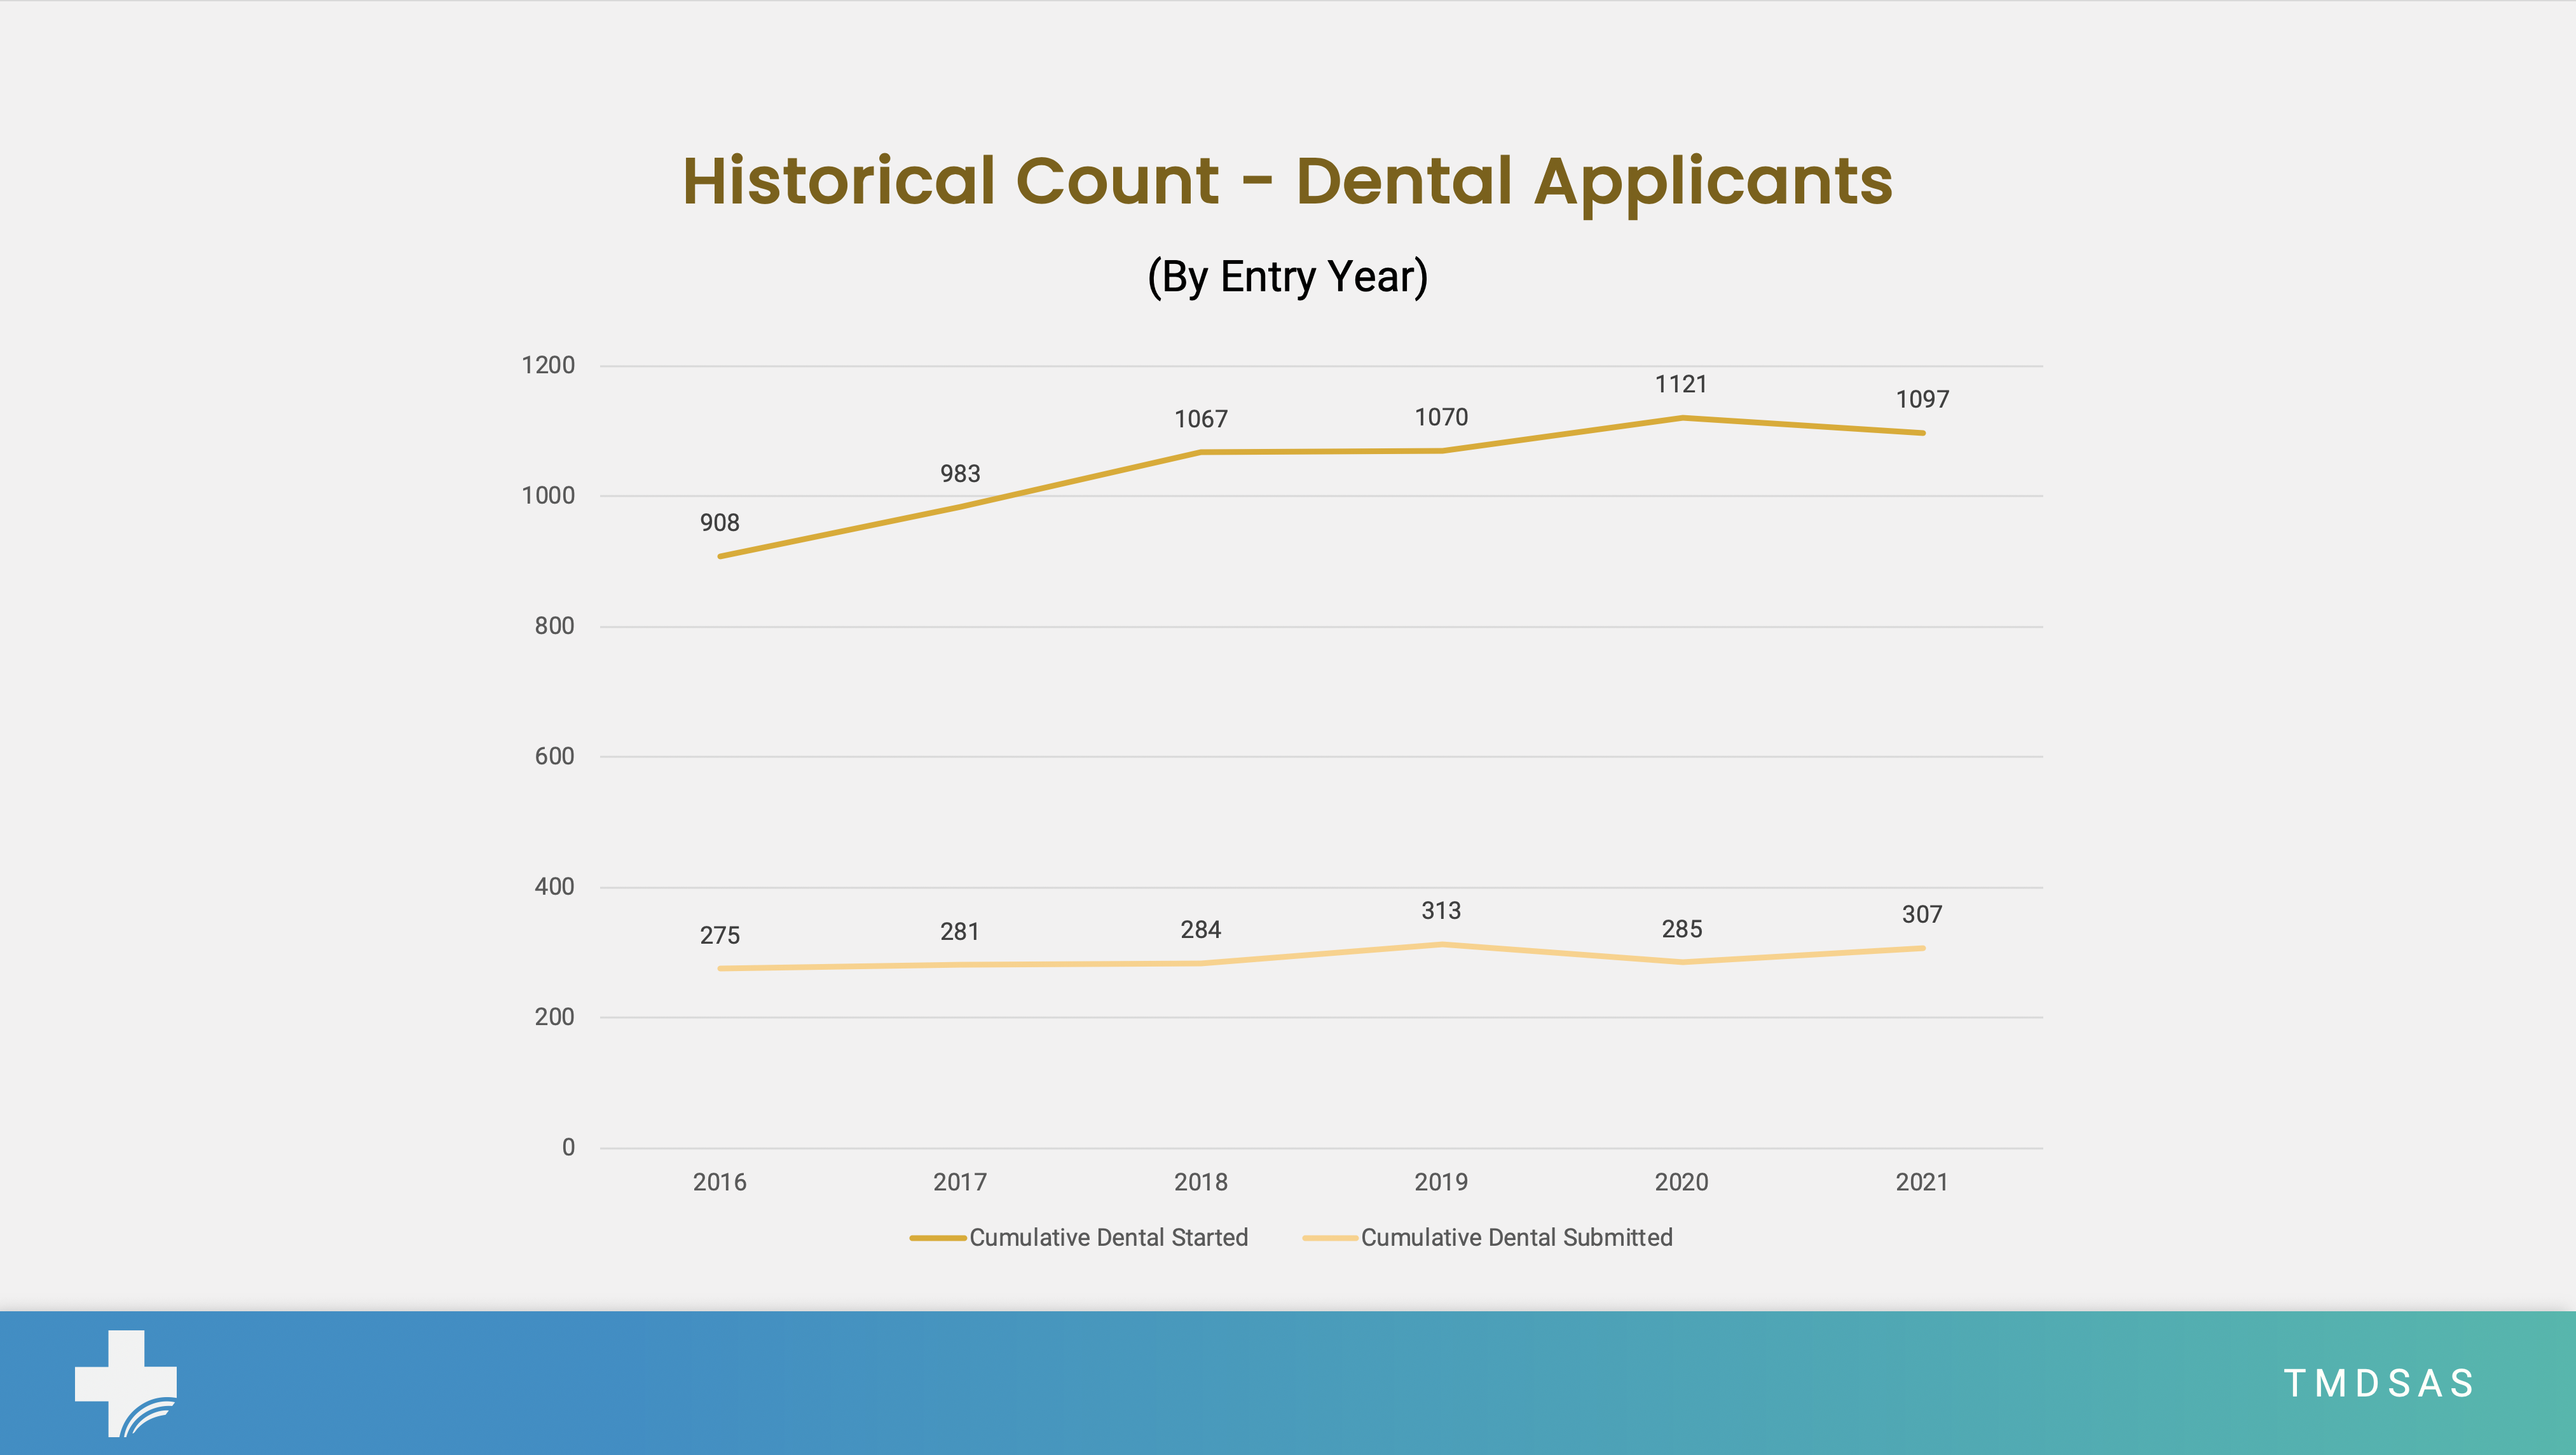 EY21 Dental Applications as of June 15, 2020